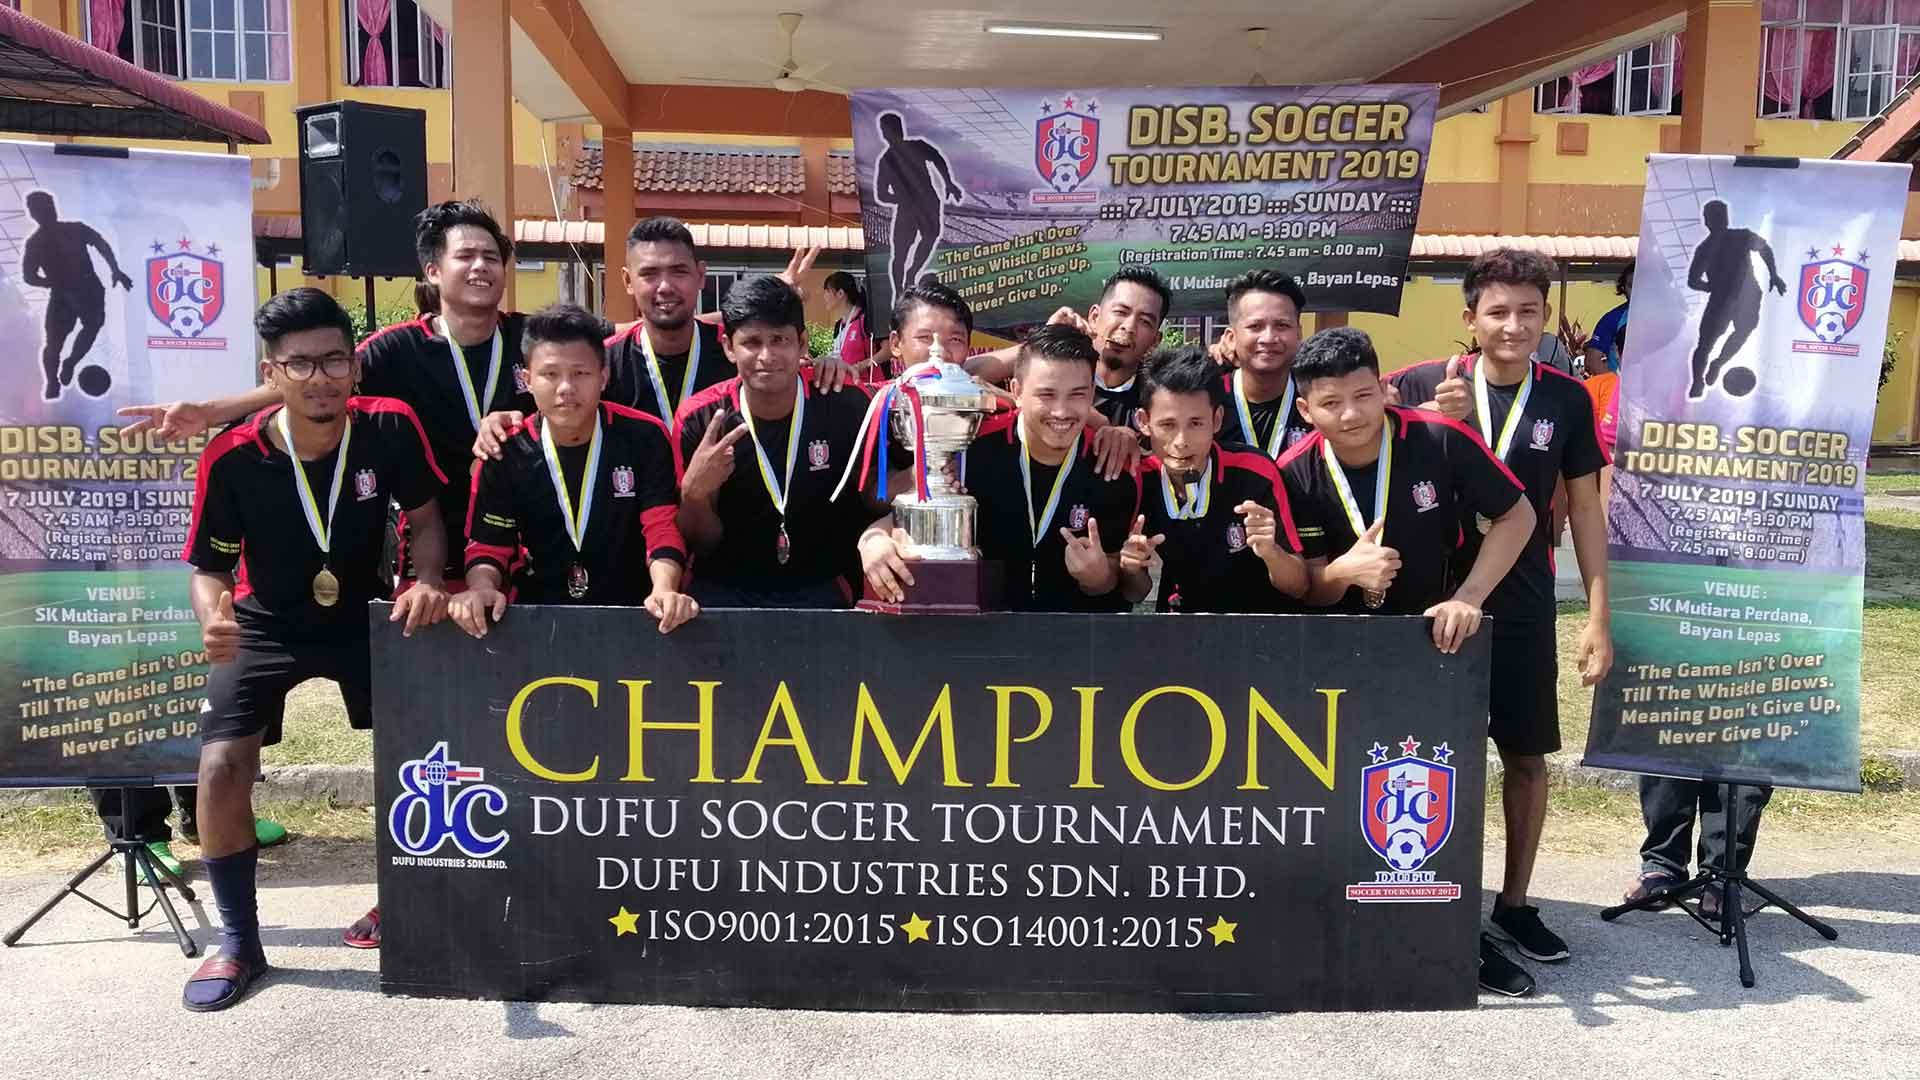 Annual Soccer Tournament 2019